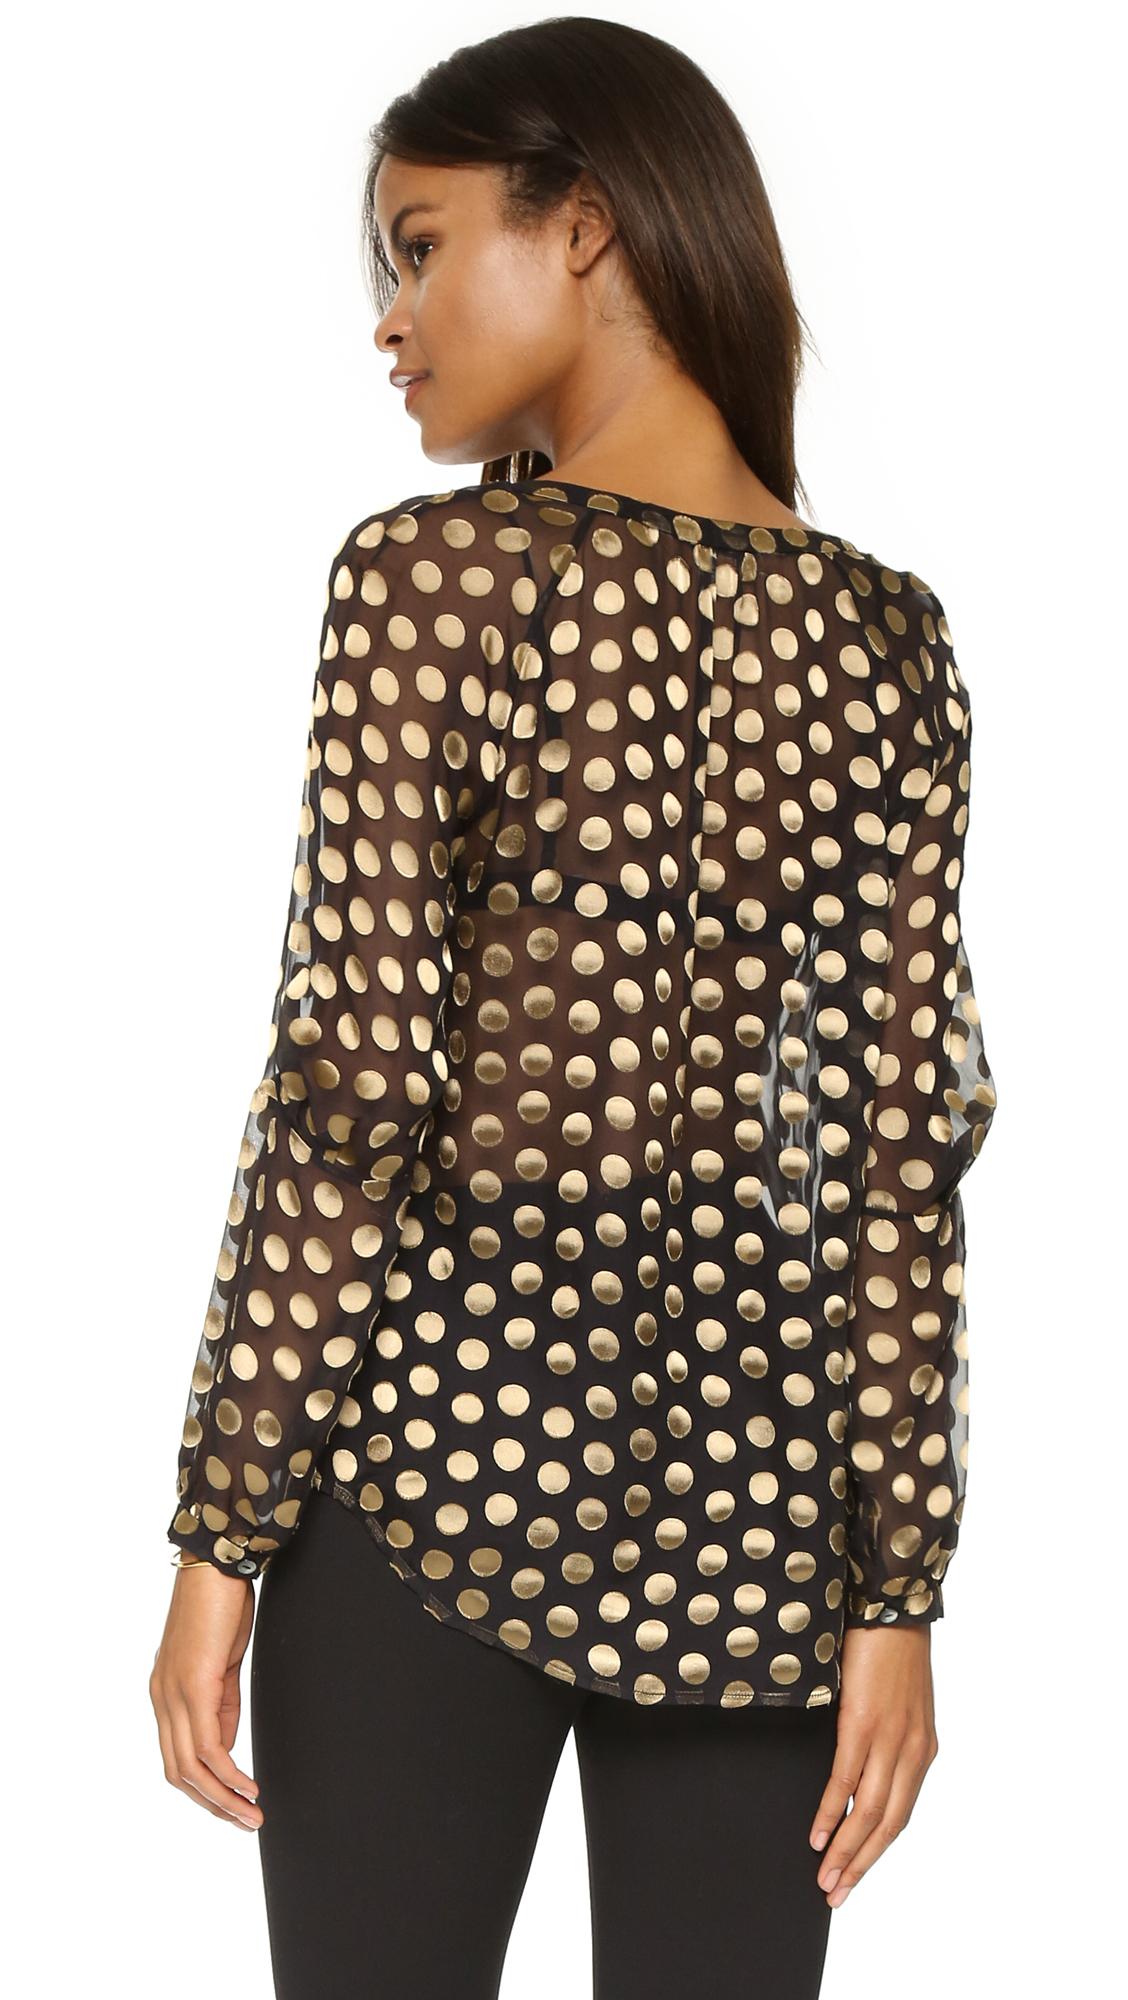 Diane von furstenberg V Neck Blouse - Black/gold in Black | Lyst